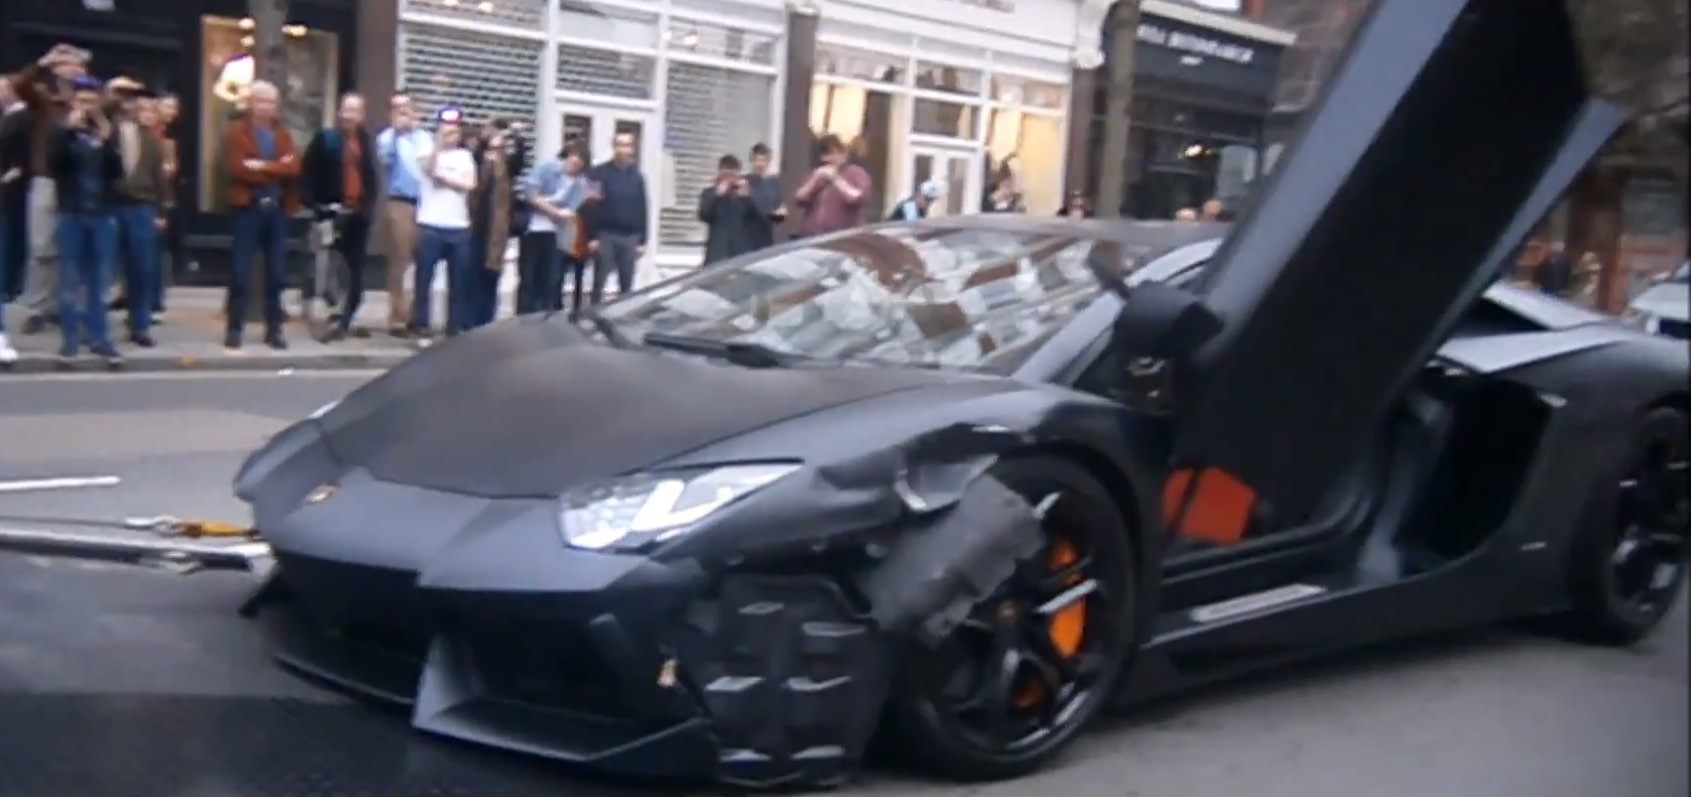 matte black lamborghini aventador crashed in london - autoevolution